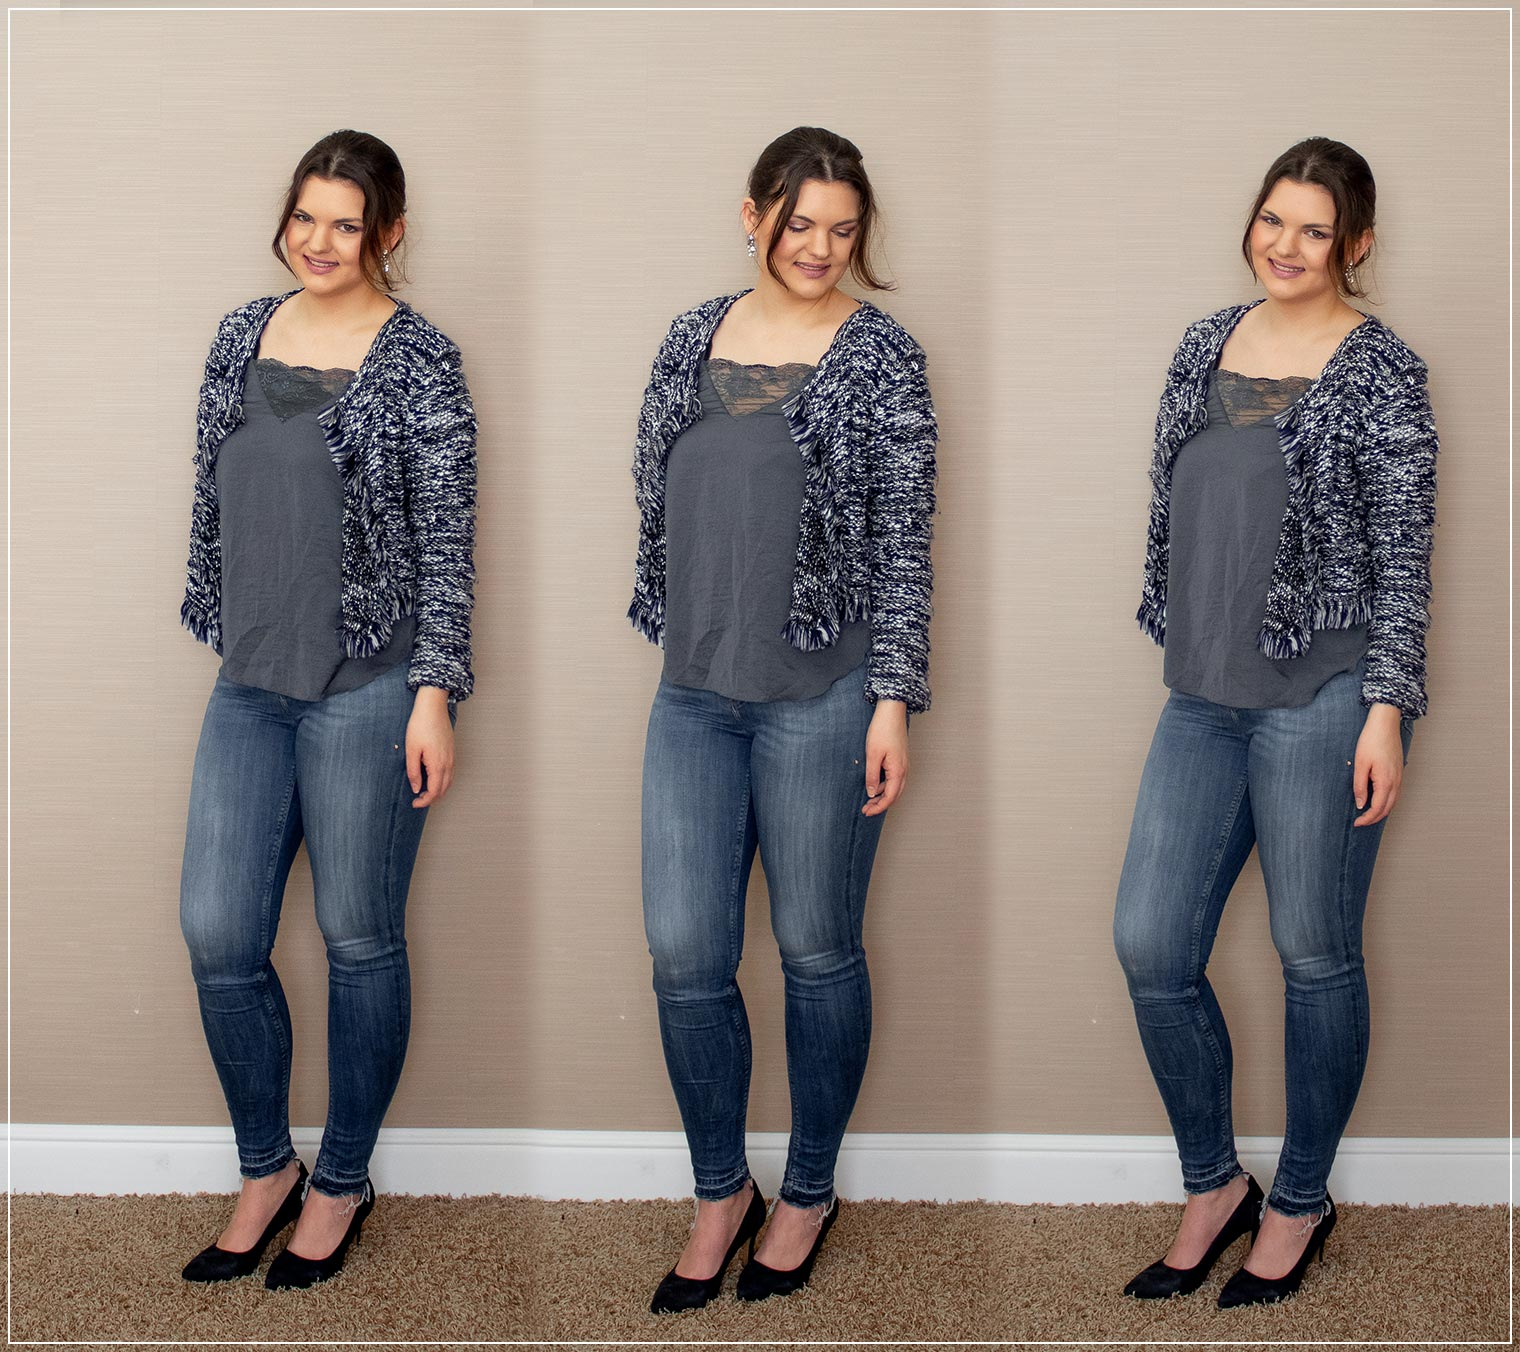 Outfit aus Jeans, Lace Top und Strickjacke